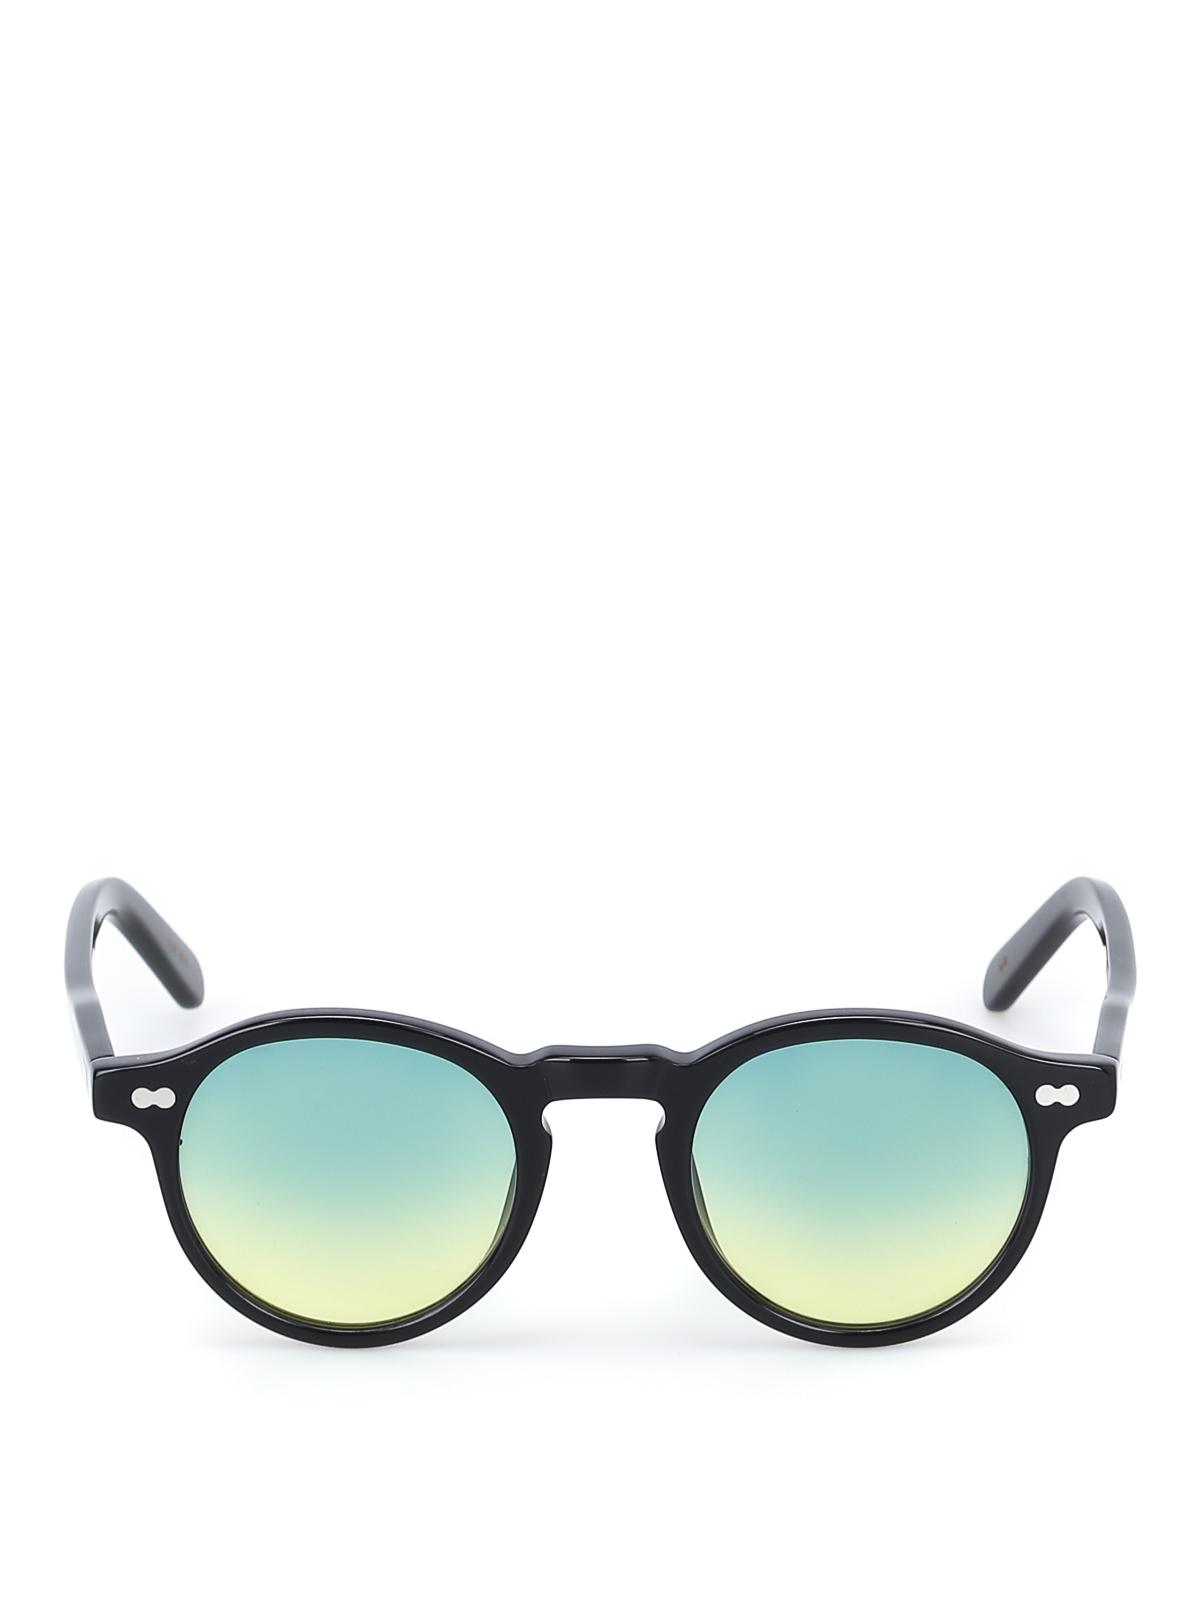 Occhiali da sole neri miltzen moscot occhiali da sole for Occhiali neri da sole